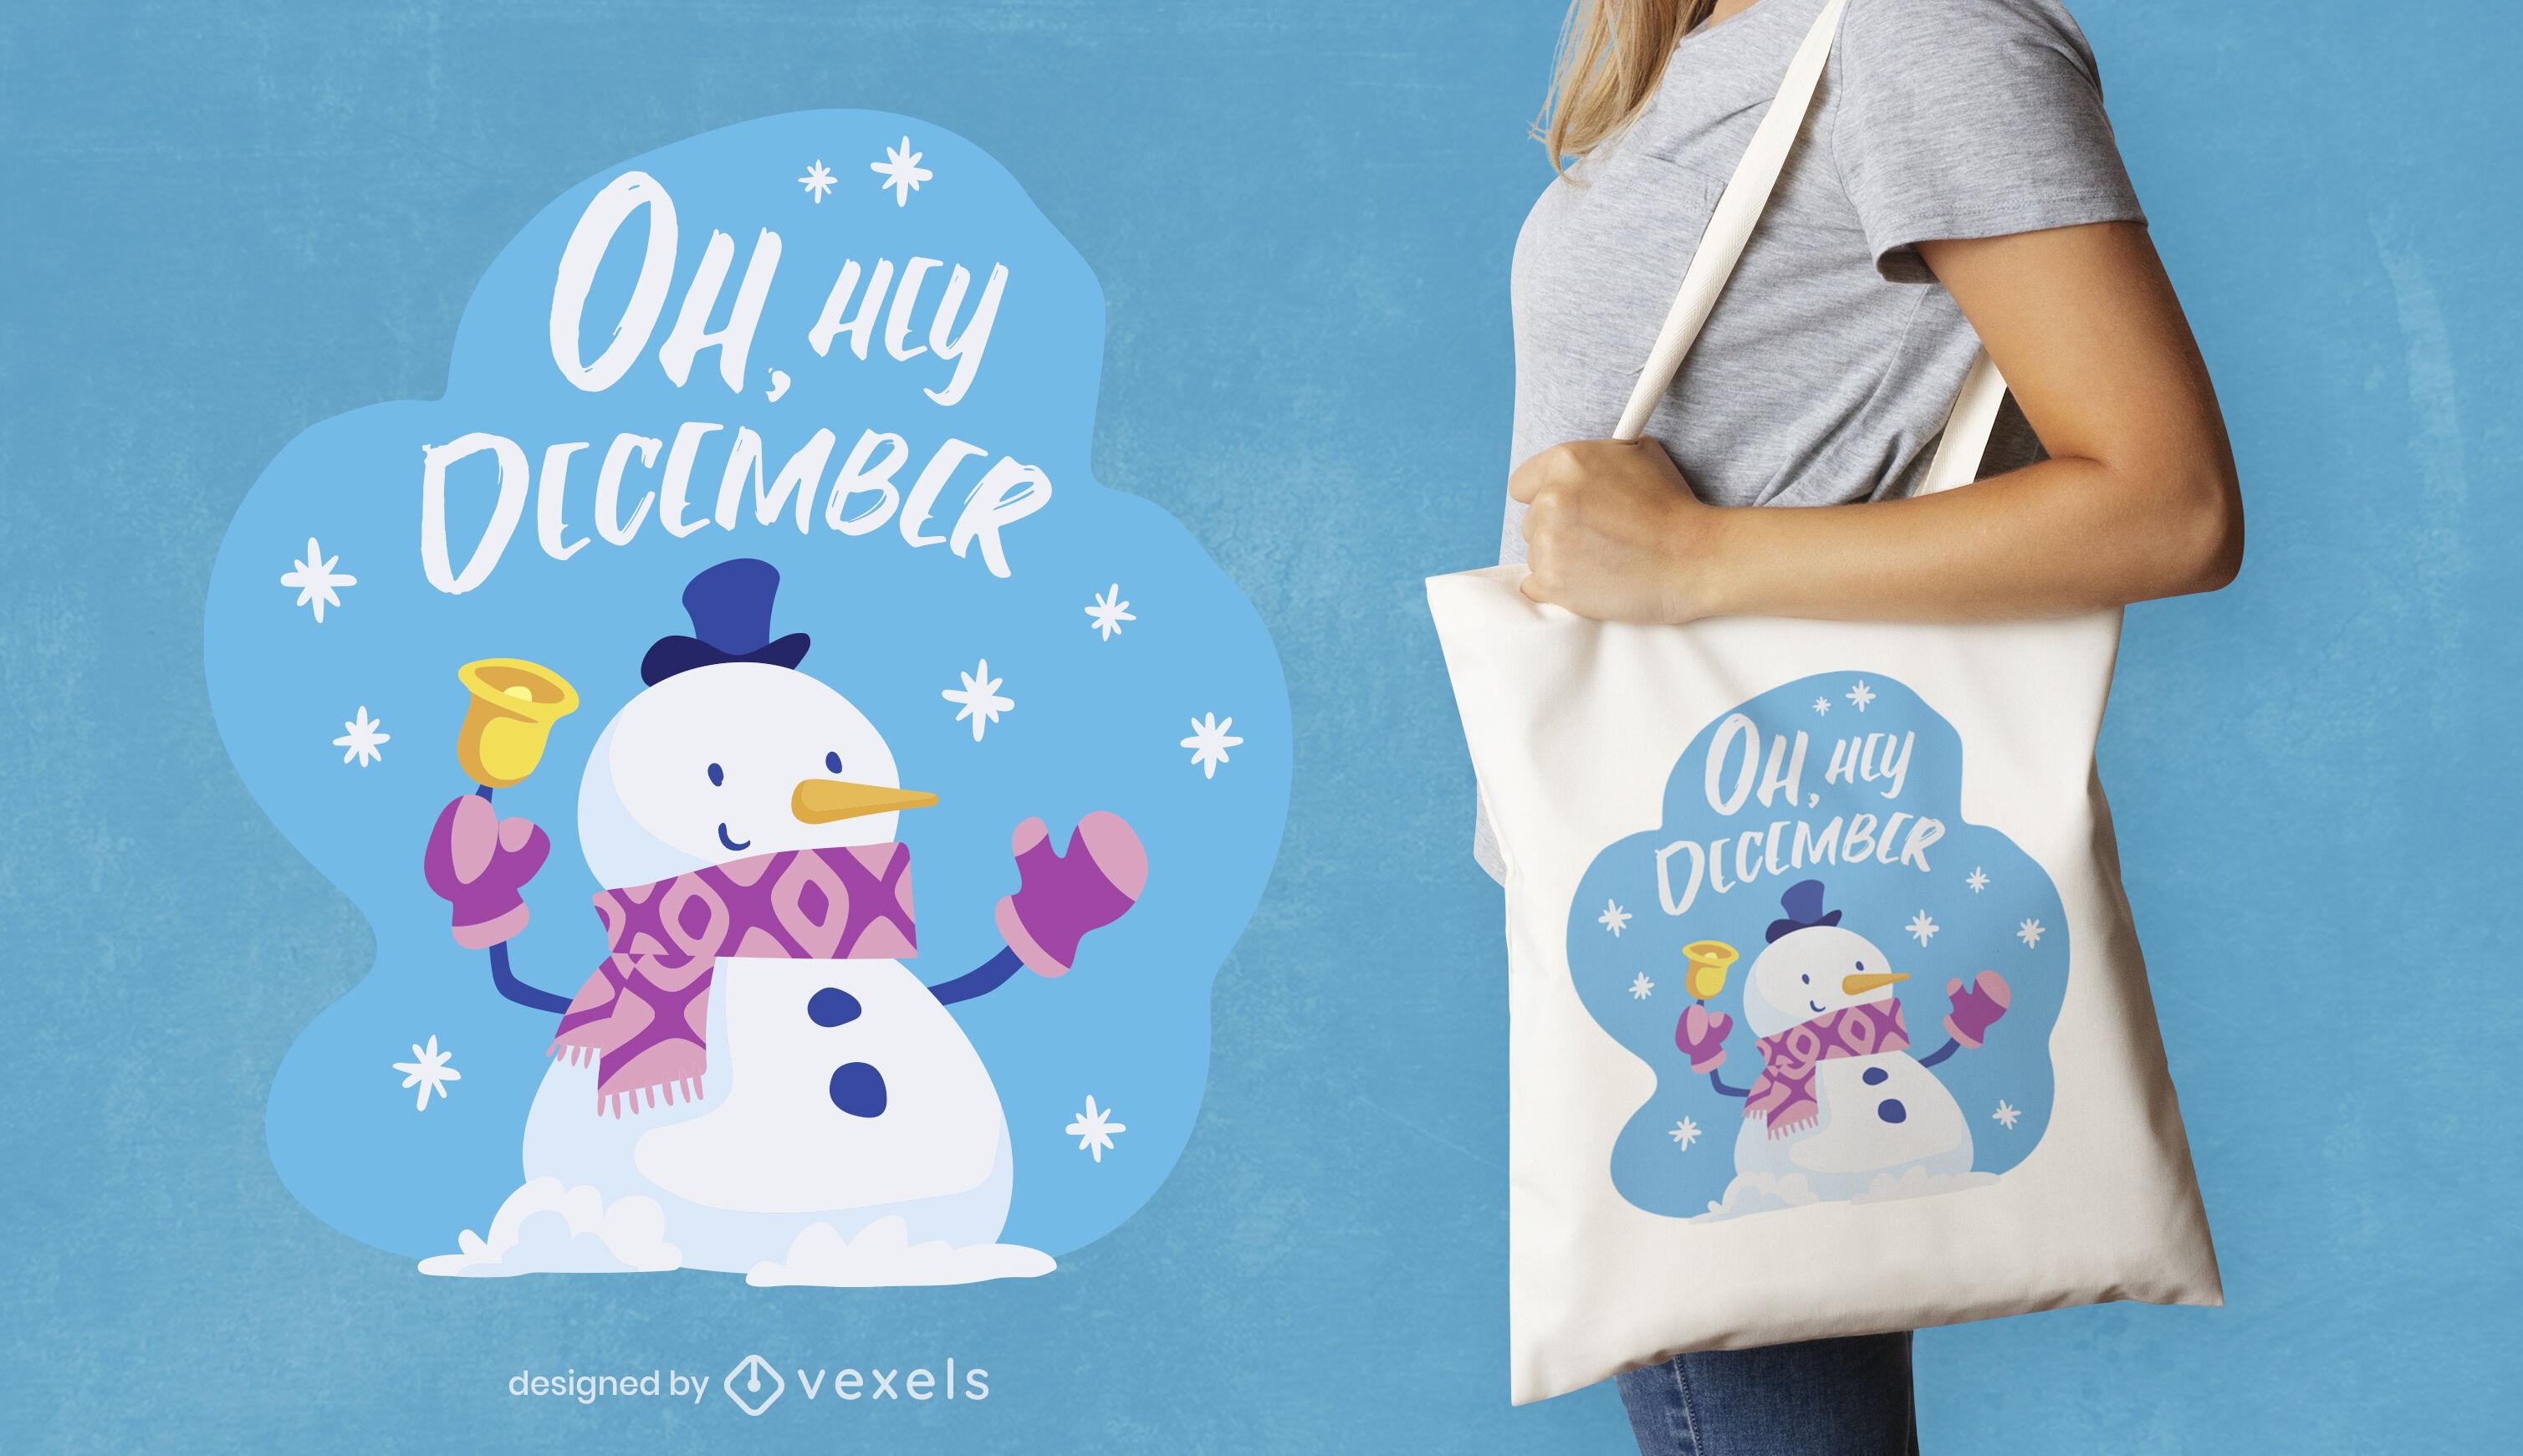 Snowman winter season tote bag design